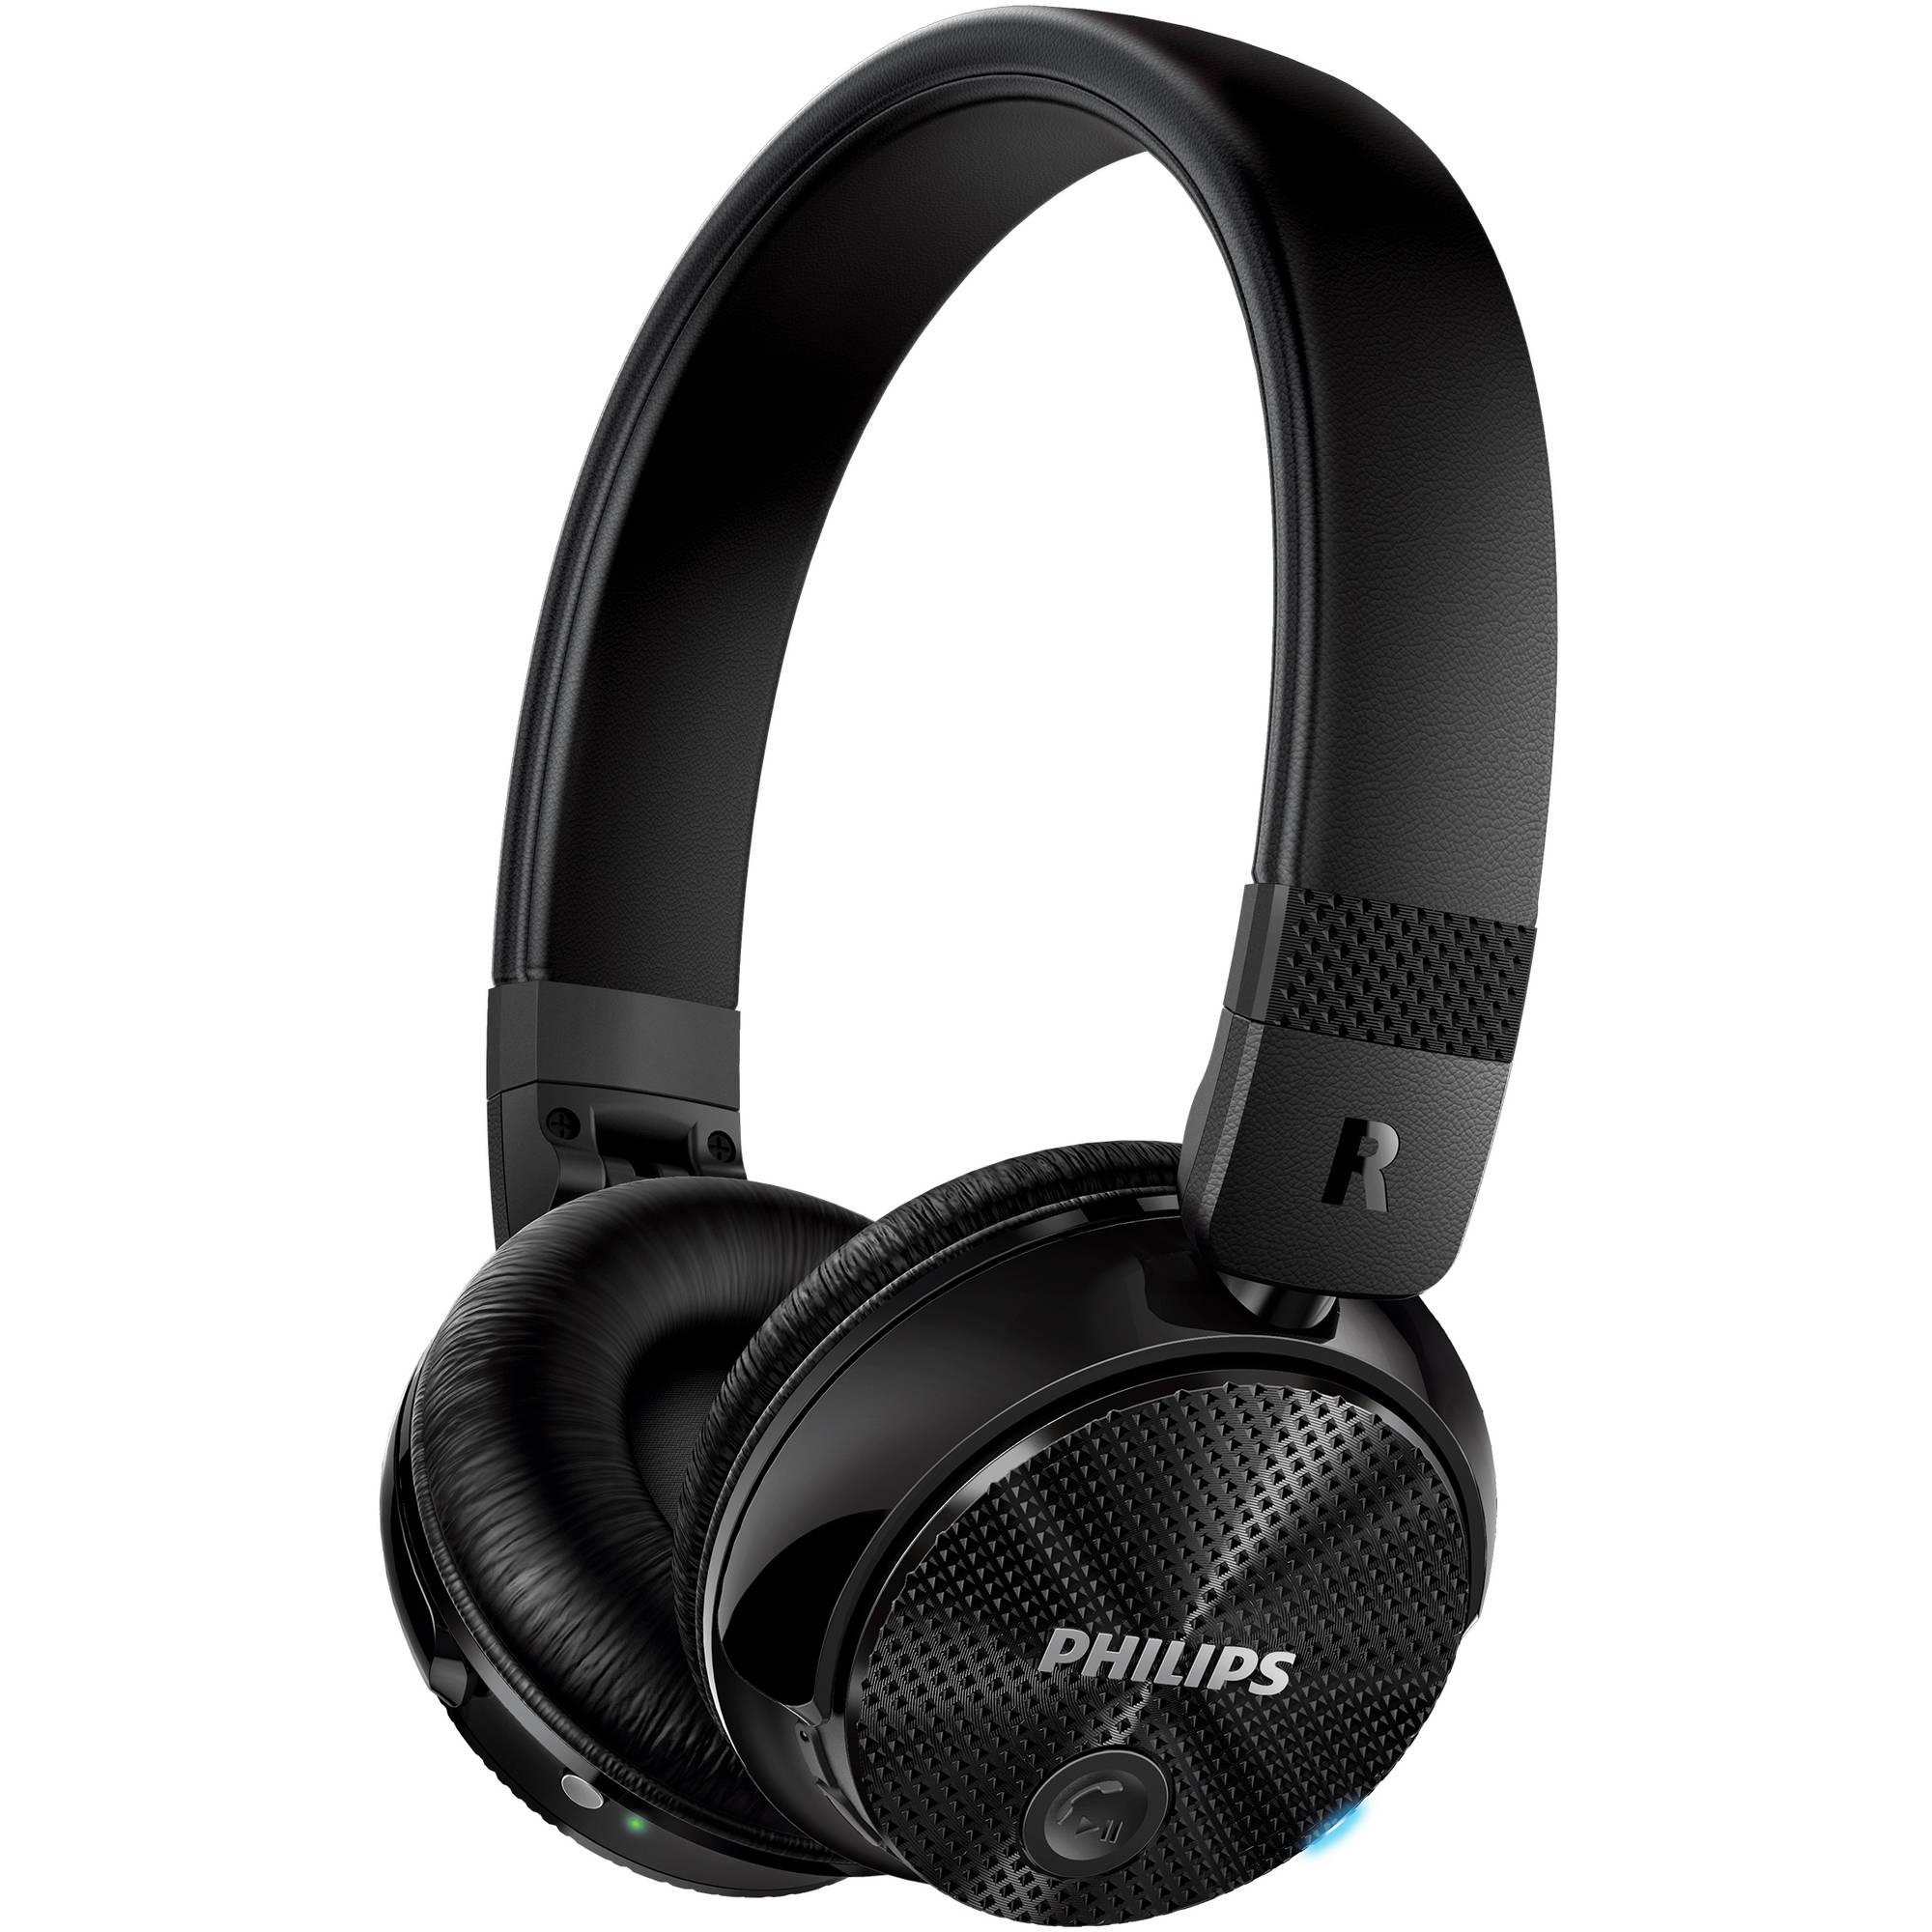 Philips SHB8750NC Bluetooth Noise-Canceling Headphone $20 Walmart YMMV